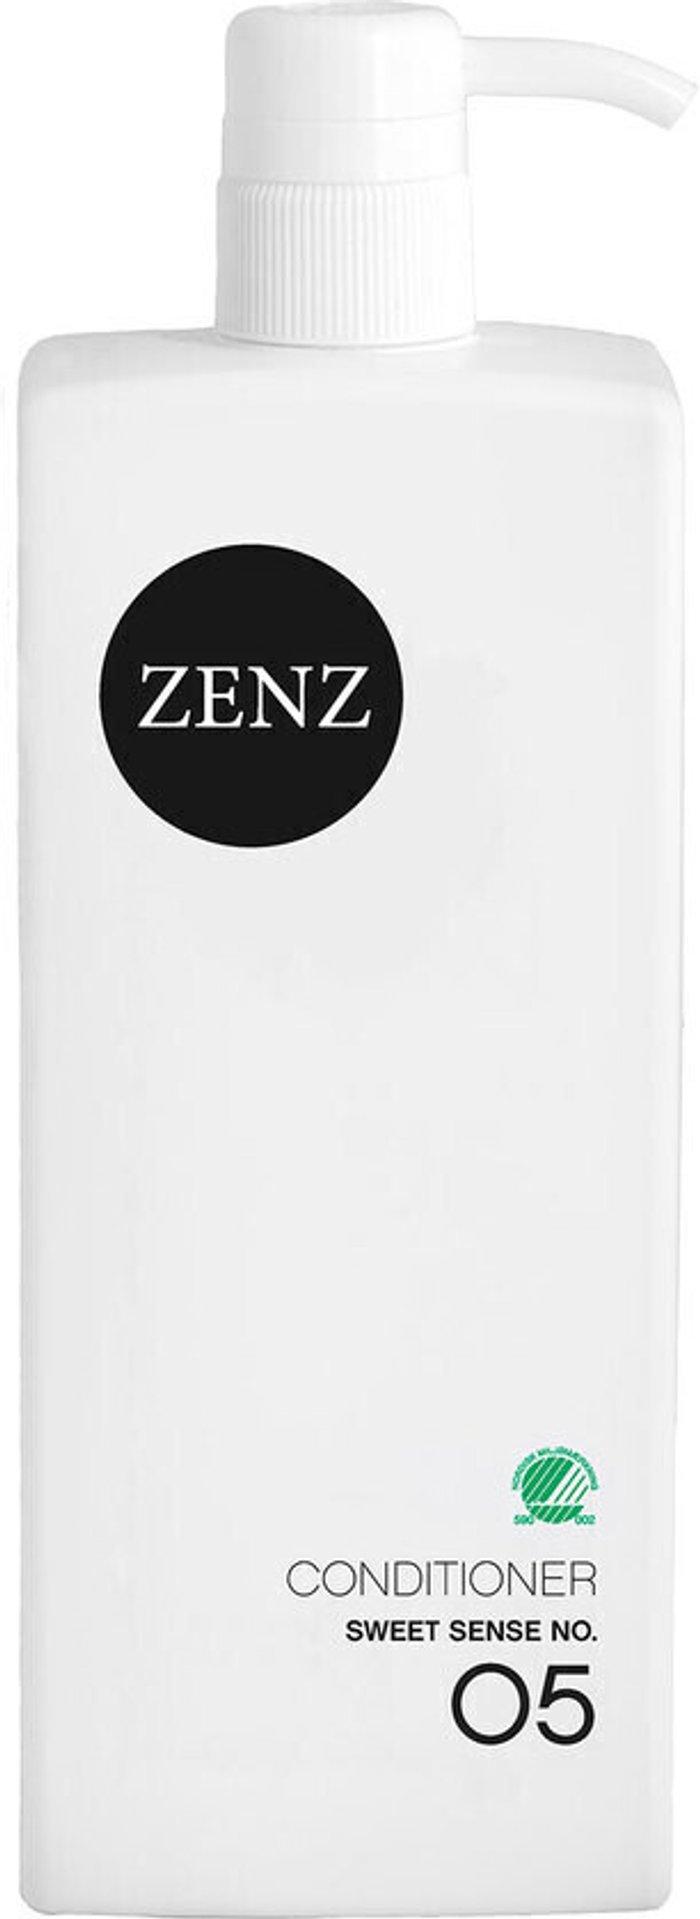 Zenz Organic Zenz Organic No.05 Sweet Sense Conditioner